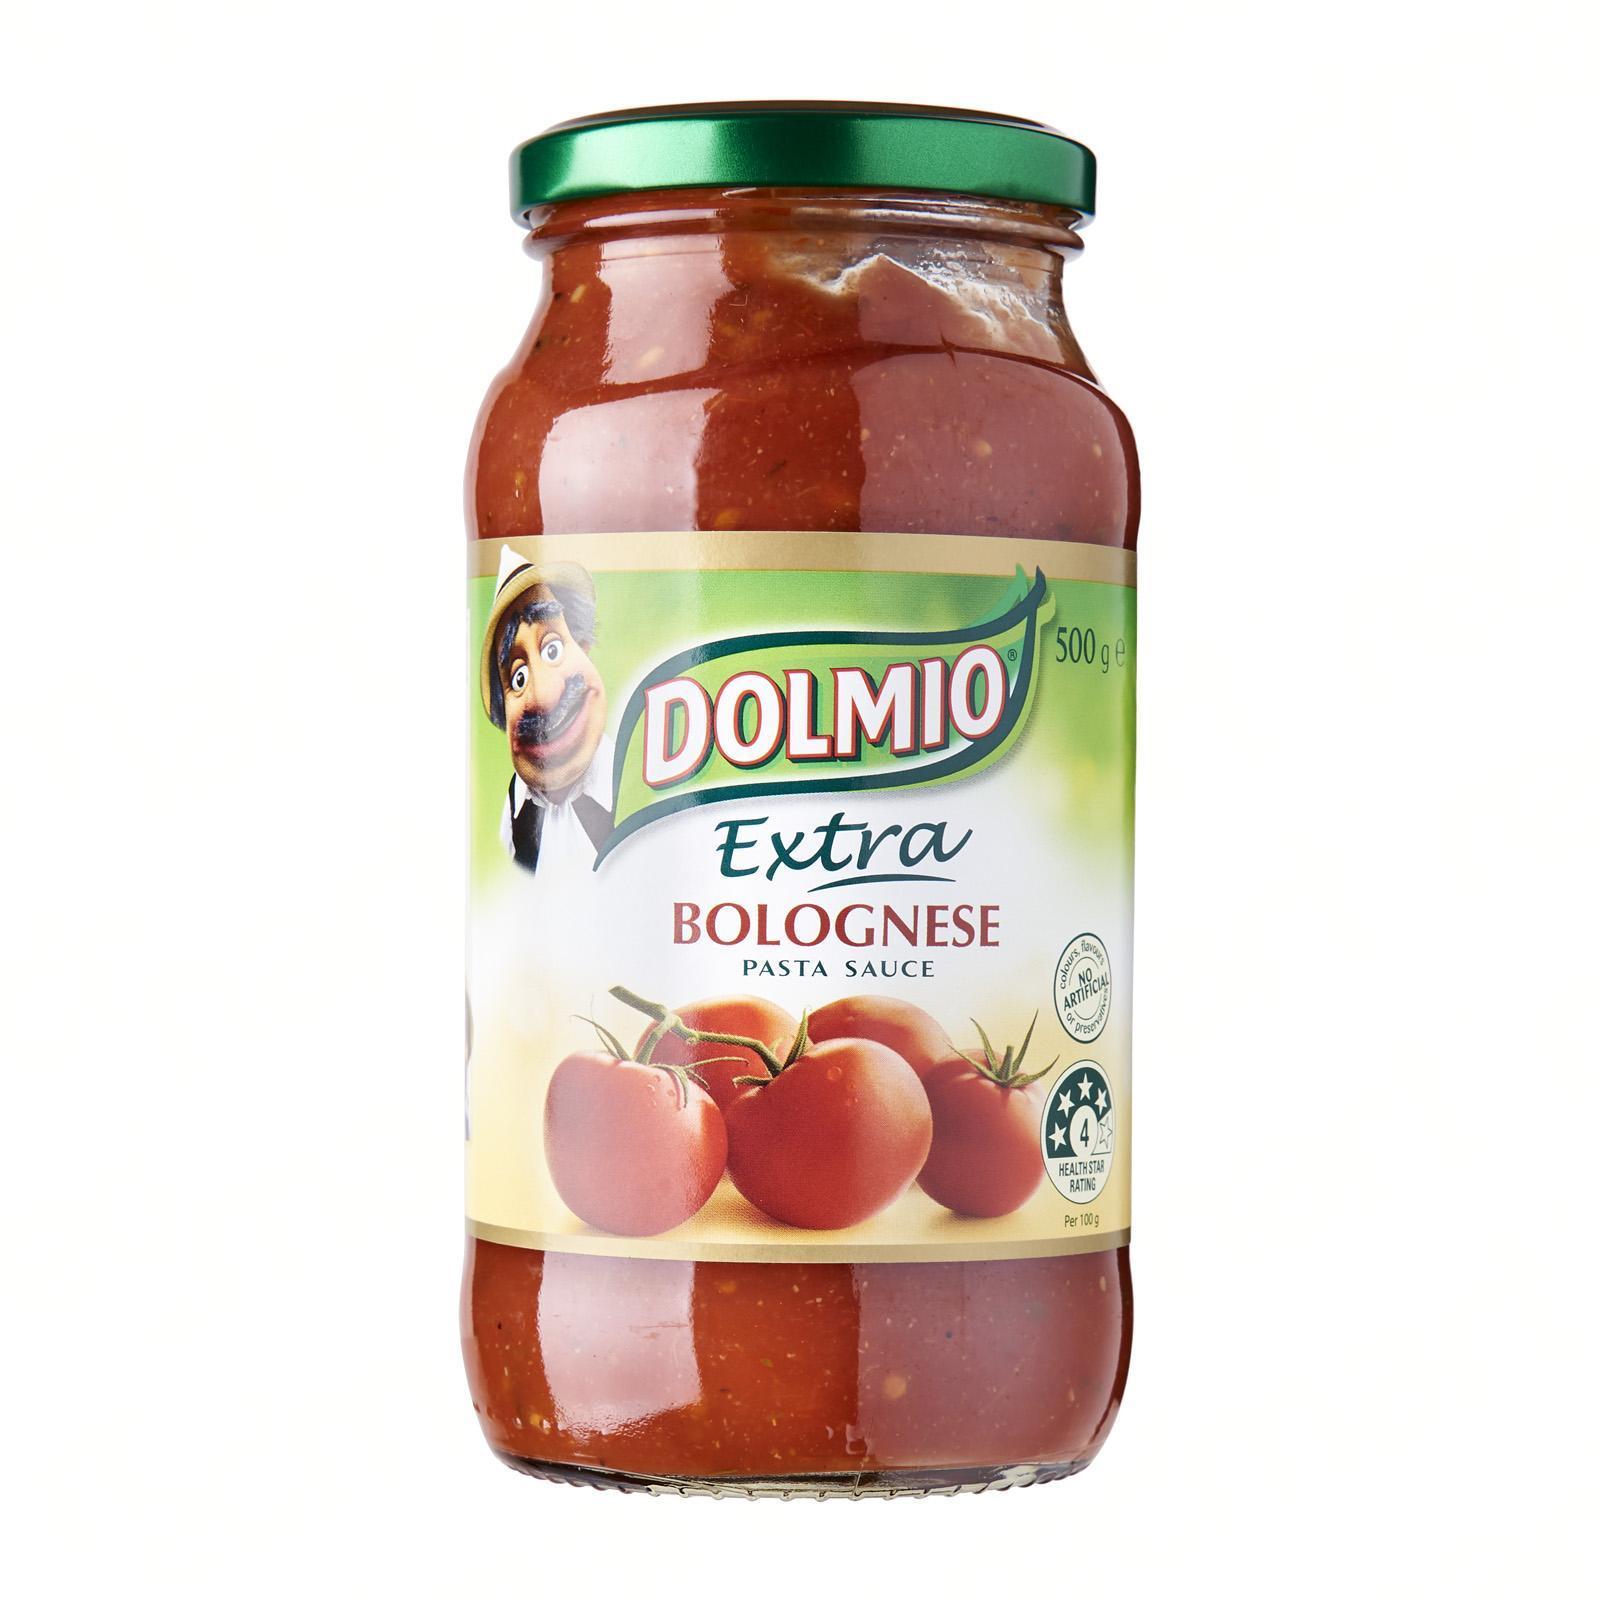 Dolmio Extra Bolognese Pasta Sauce